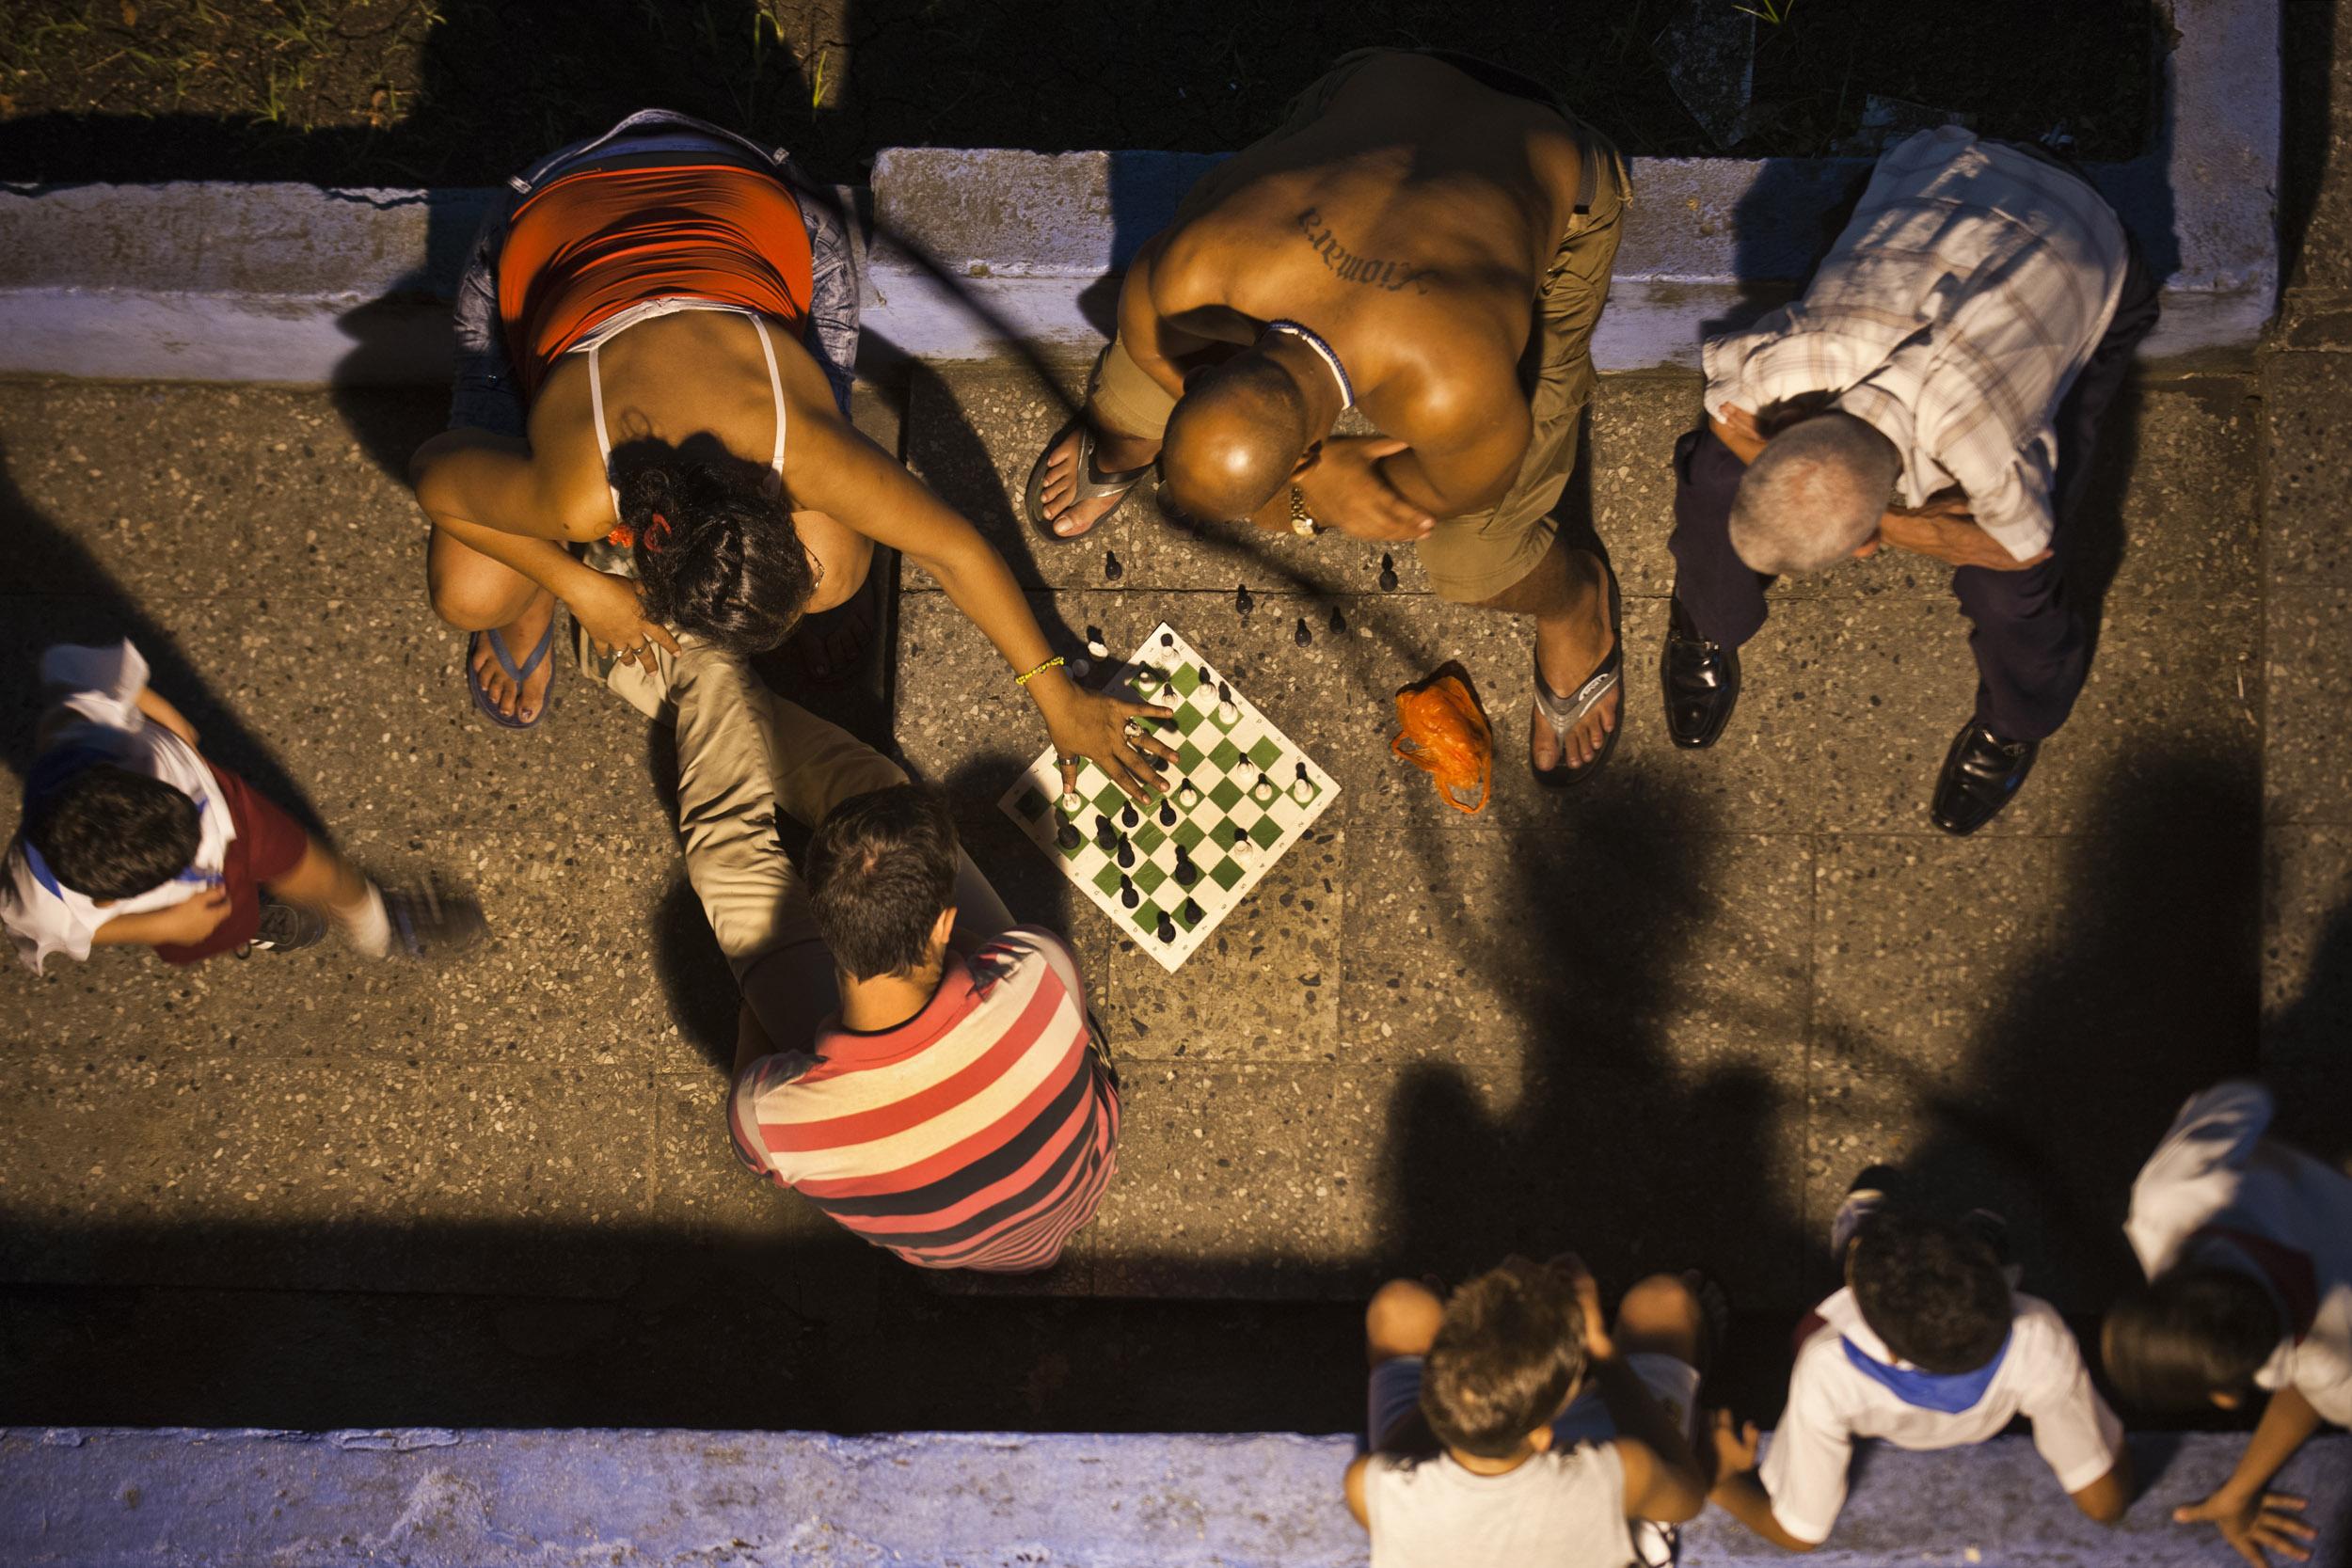 Habana 03 - Cuba - Hector Garrido, Aerial and human photography